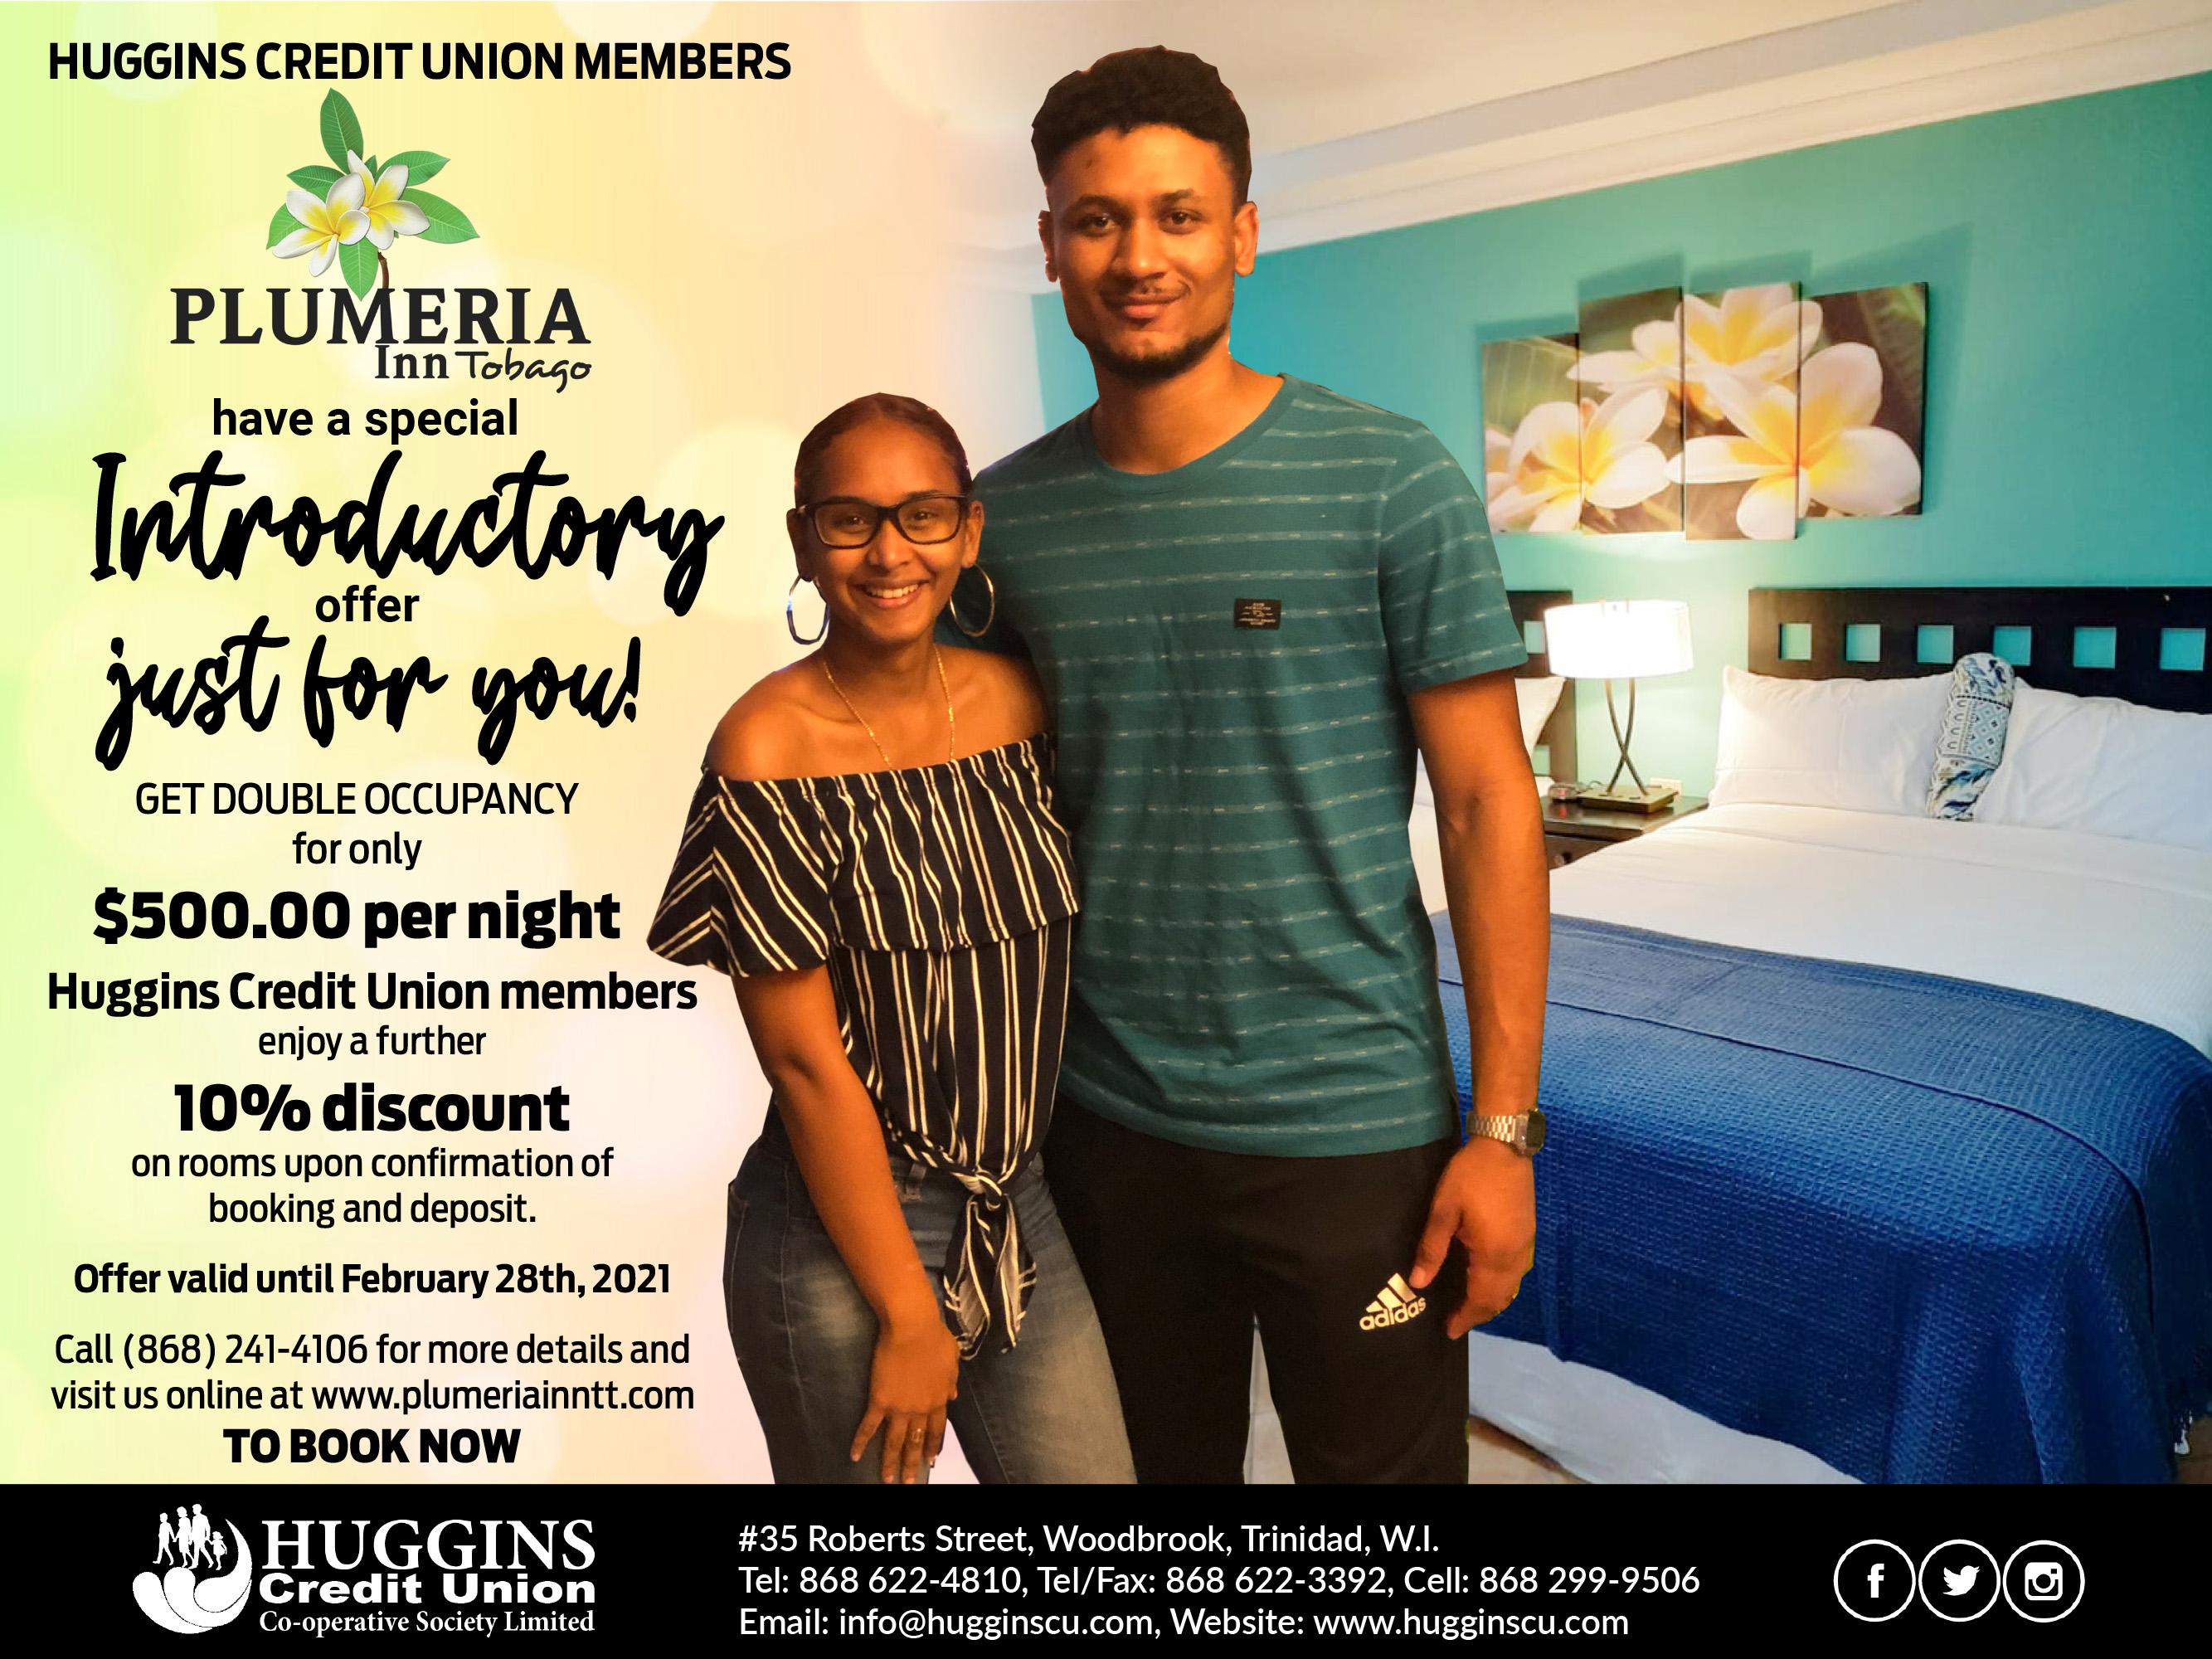 Huggins Plumeria Inn offer Dec 2020